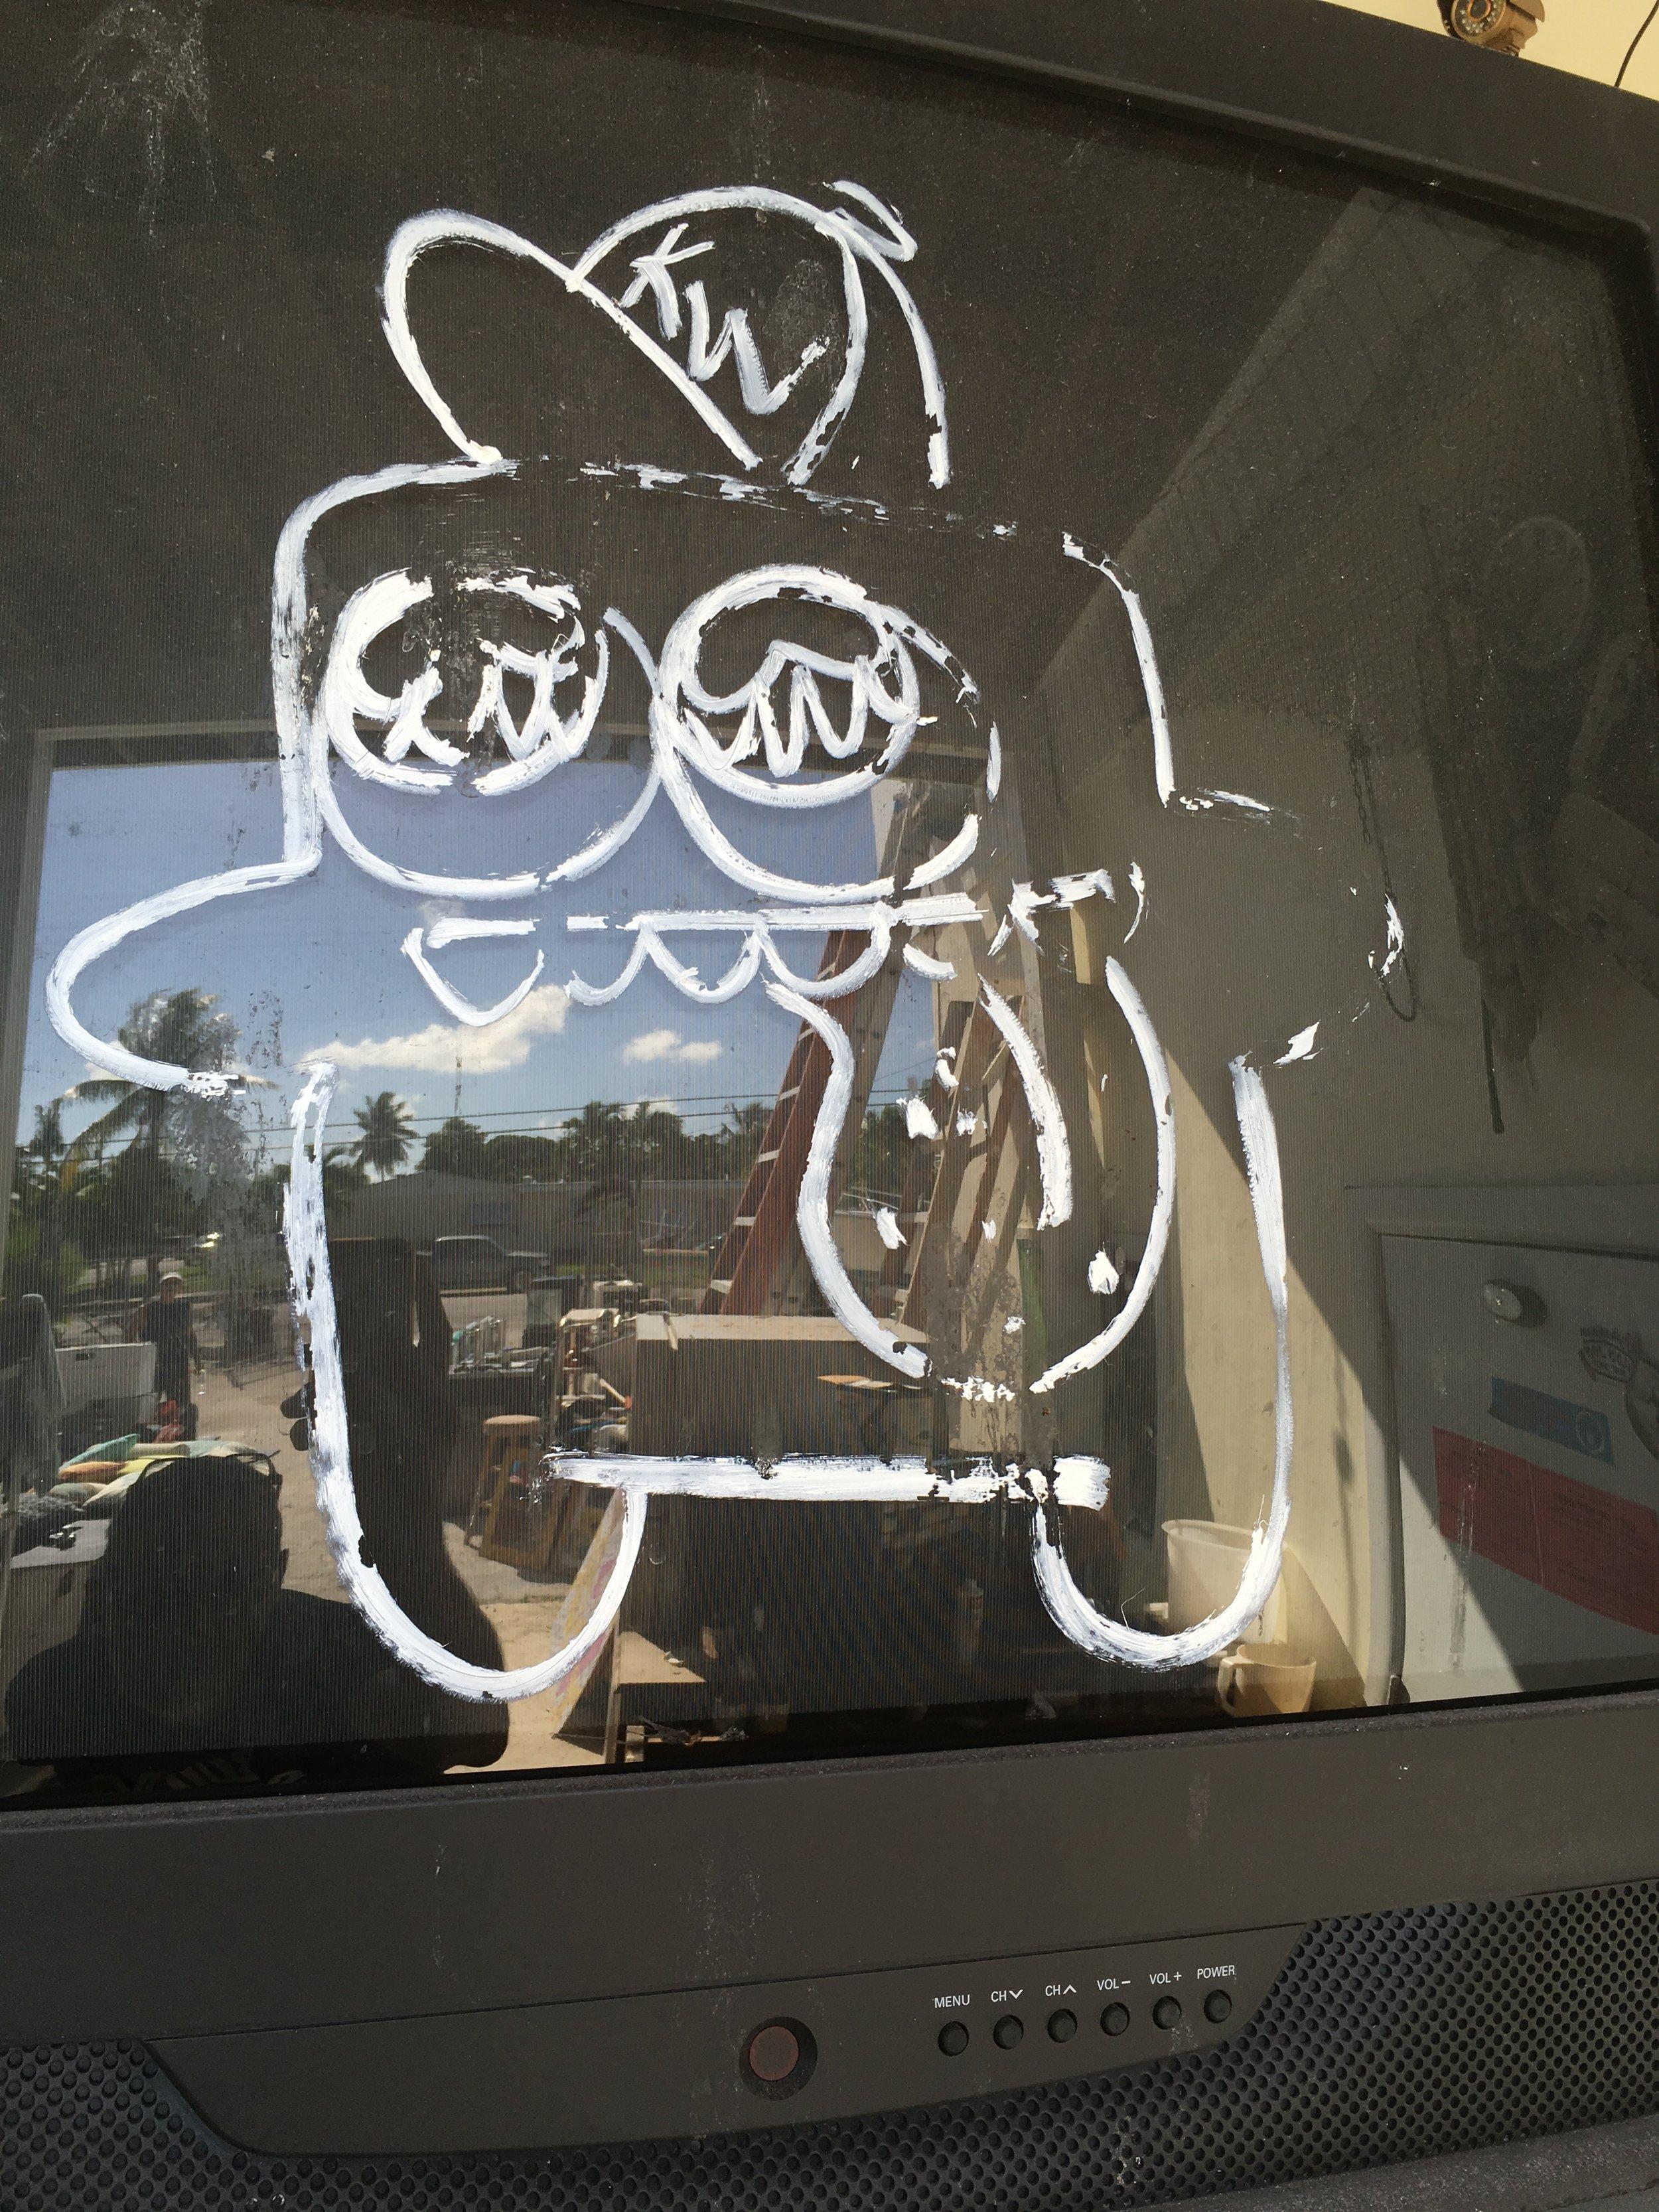 Mystery Blob graffiti on old TV